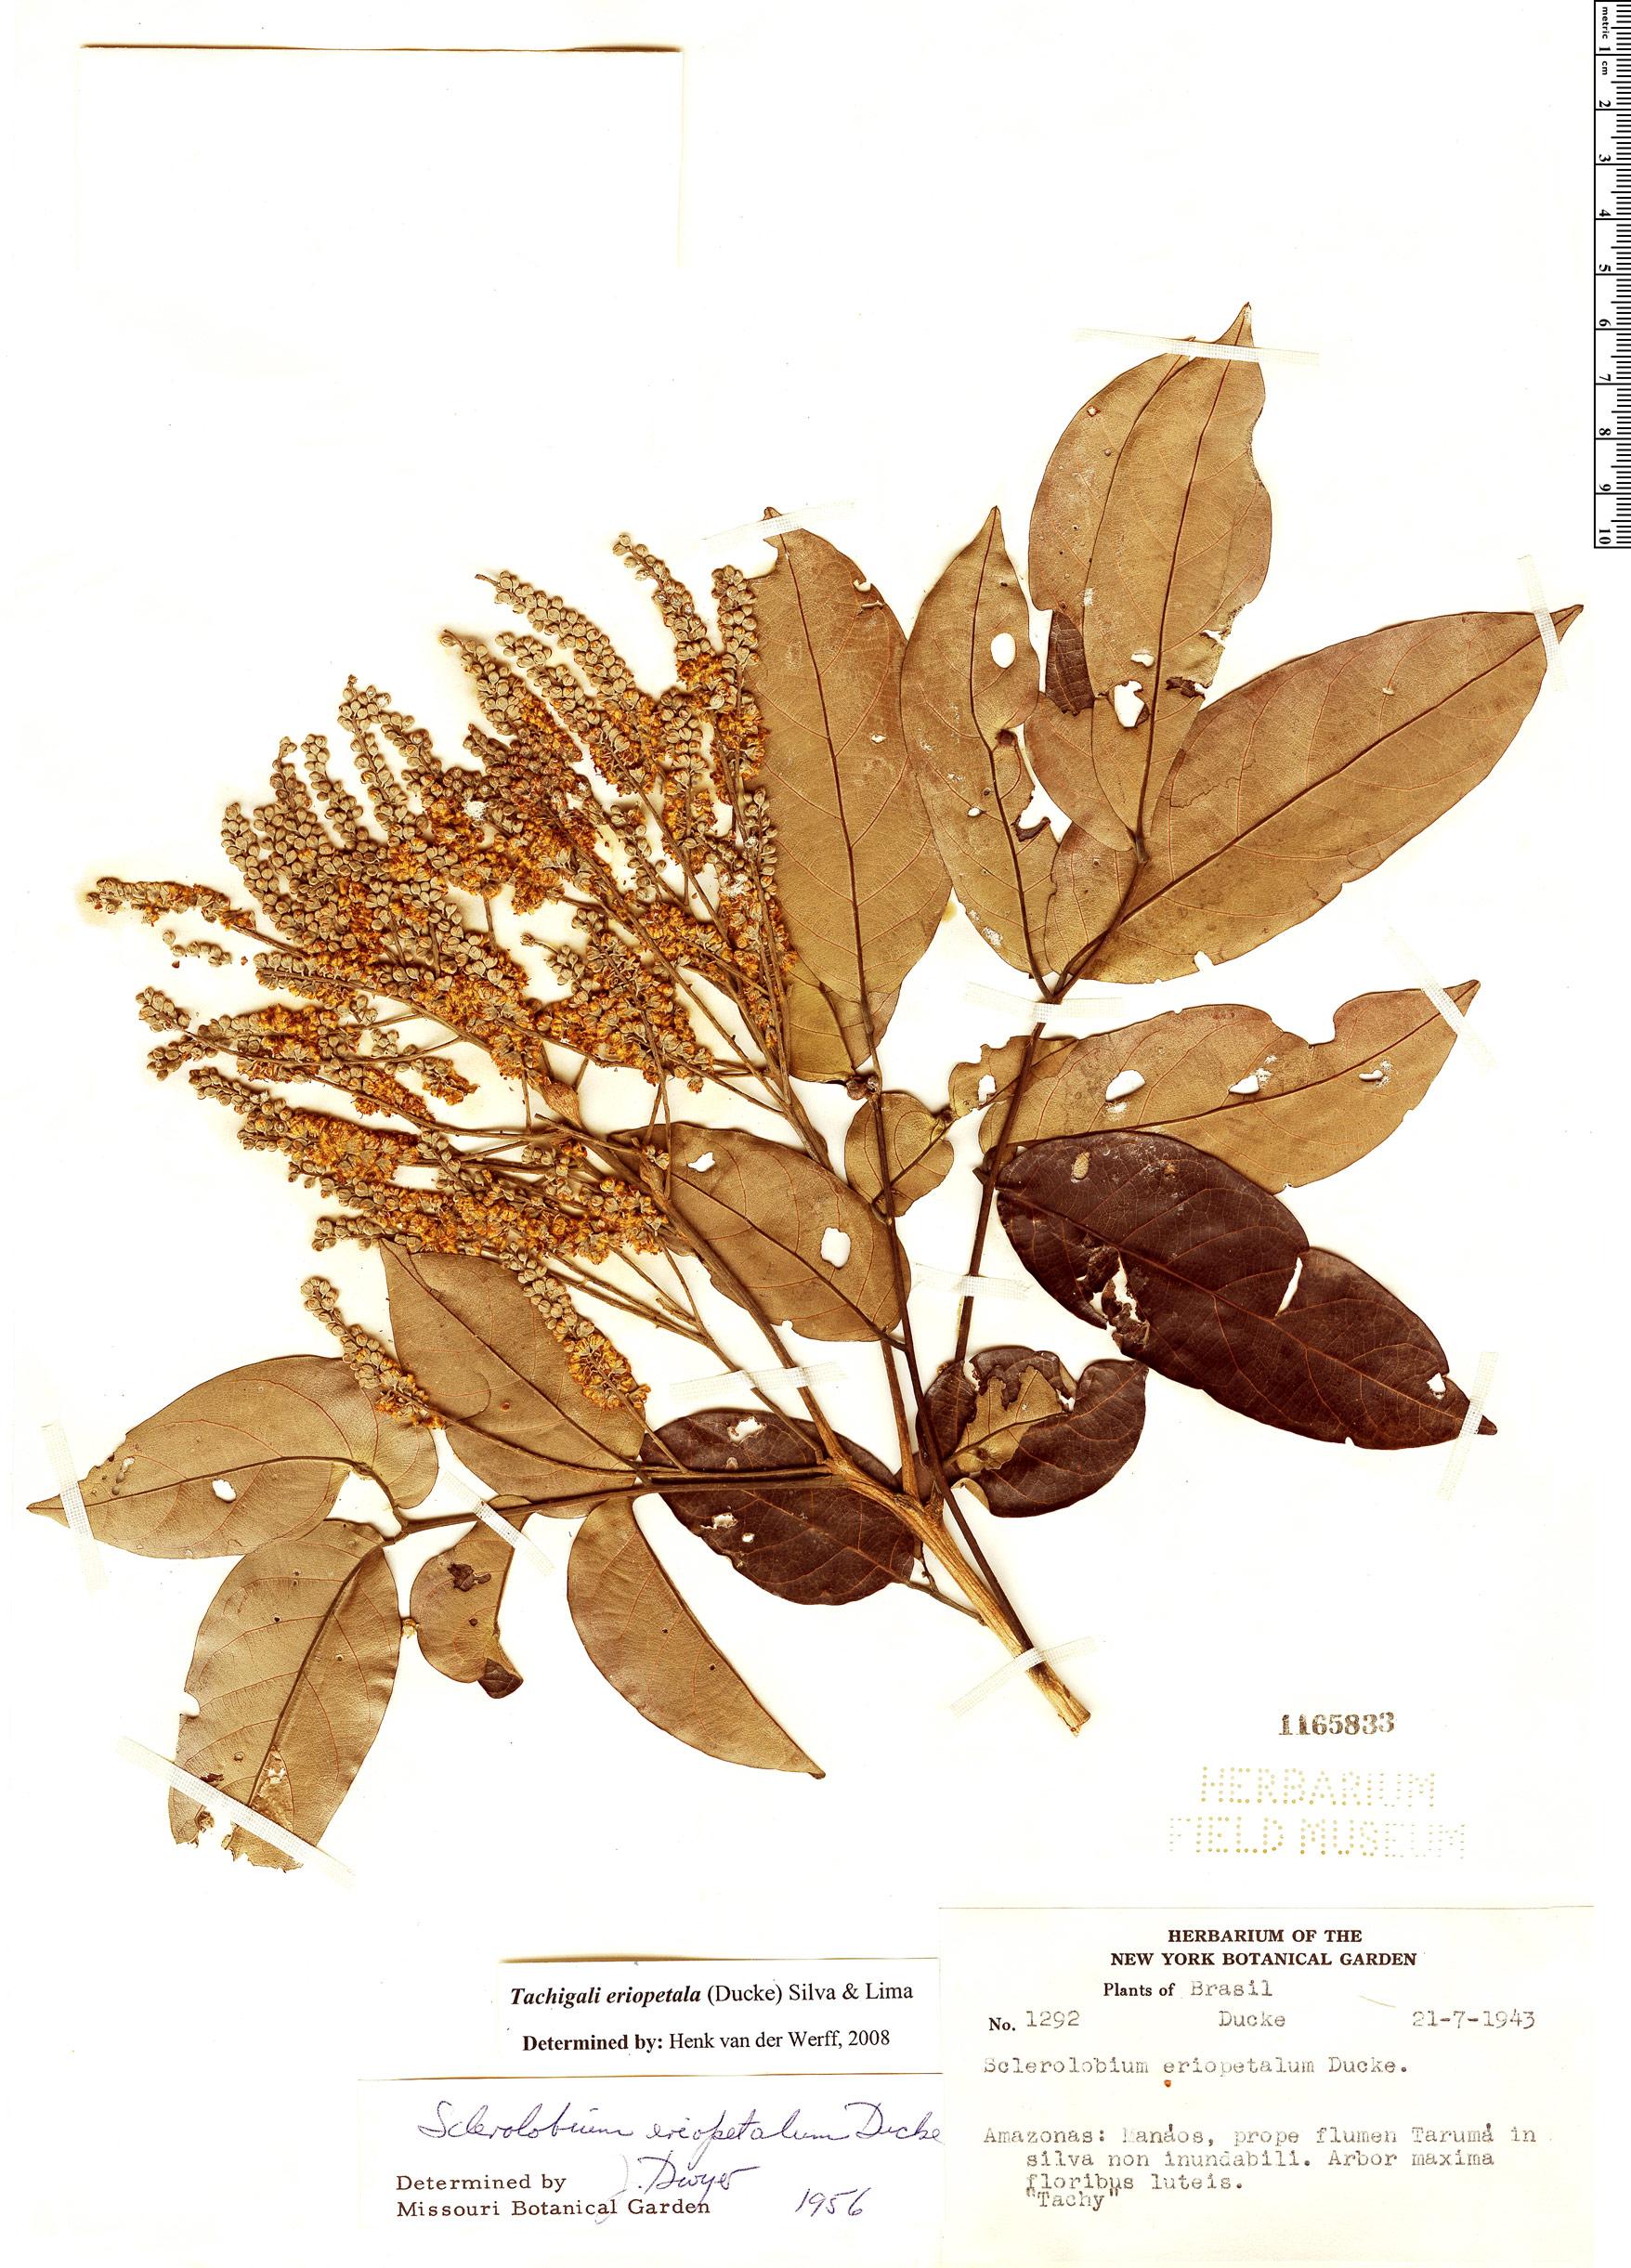 Specimen: Tachigali eriopetala